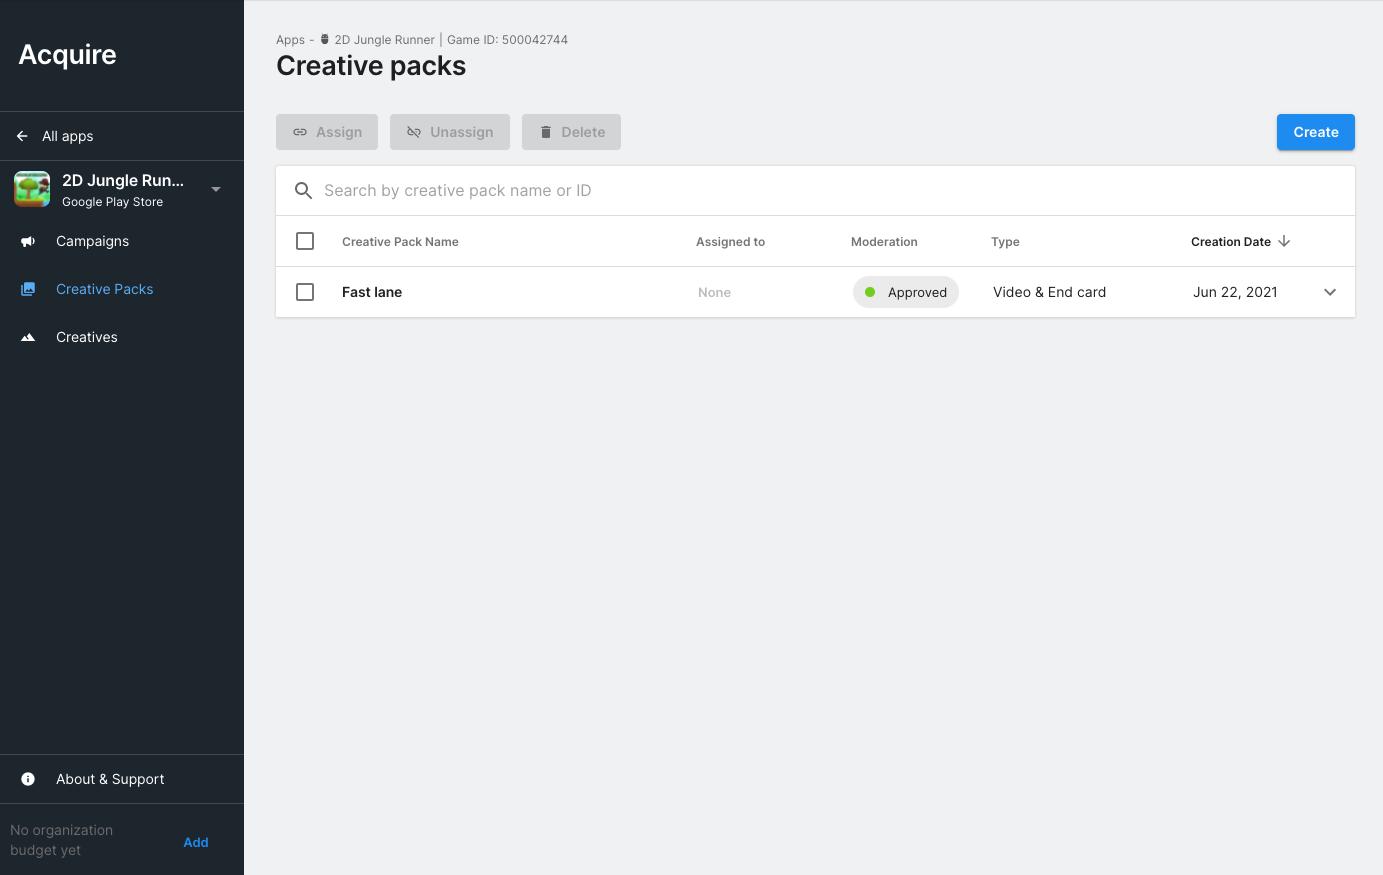 Creative Packs page